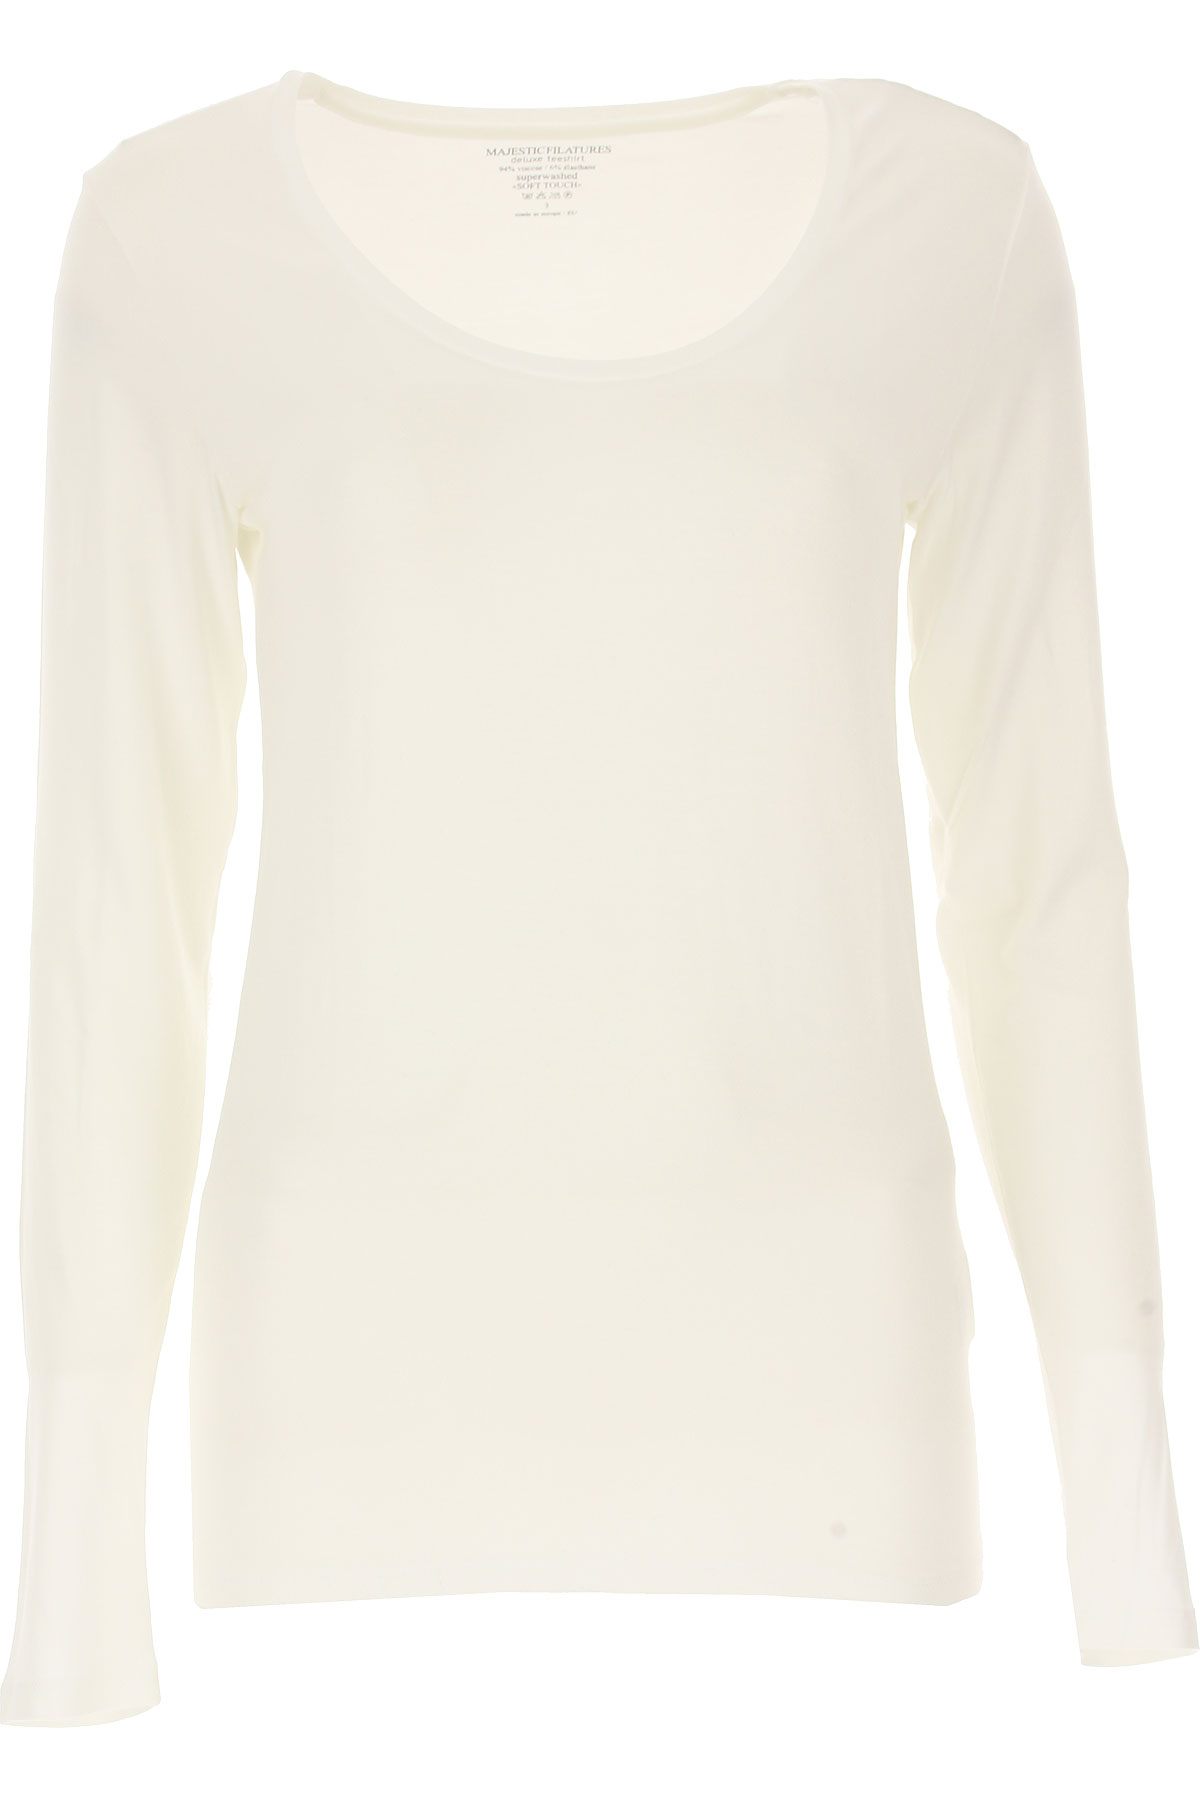 Majestic Filatures T-Shirt for Women On Sale, White, Viscose, 2019, 4 - XL - IT 46 2 - M - IT 42 3 - L - IT 44